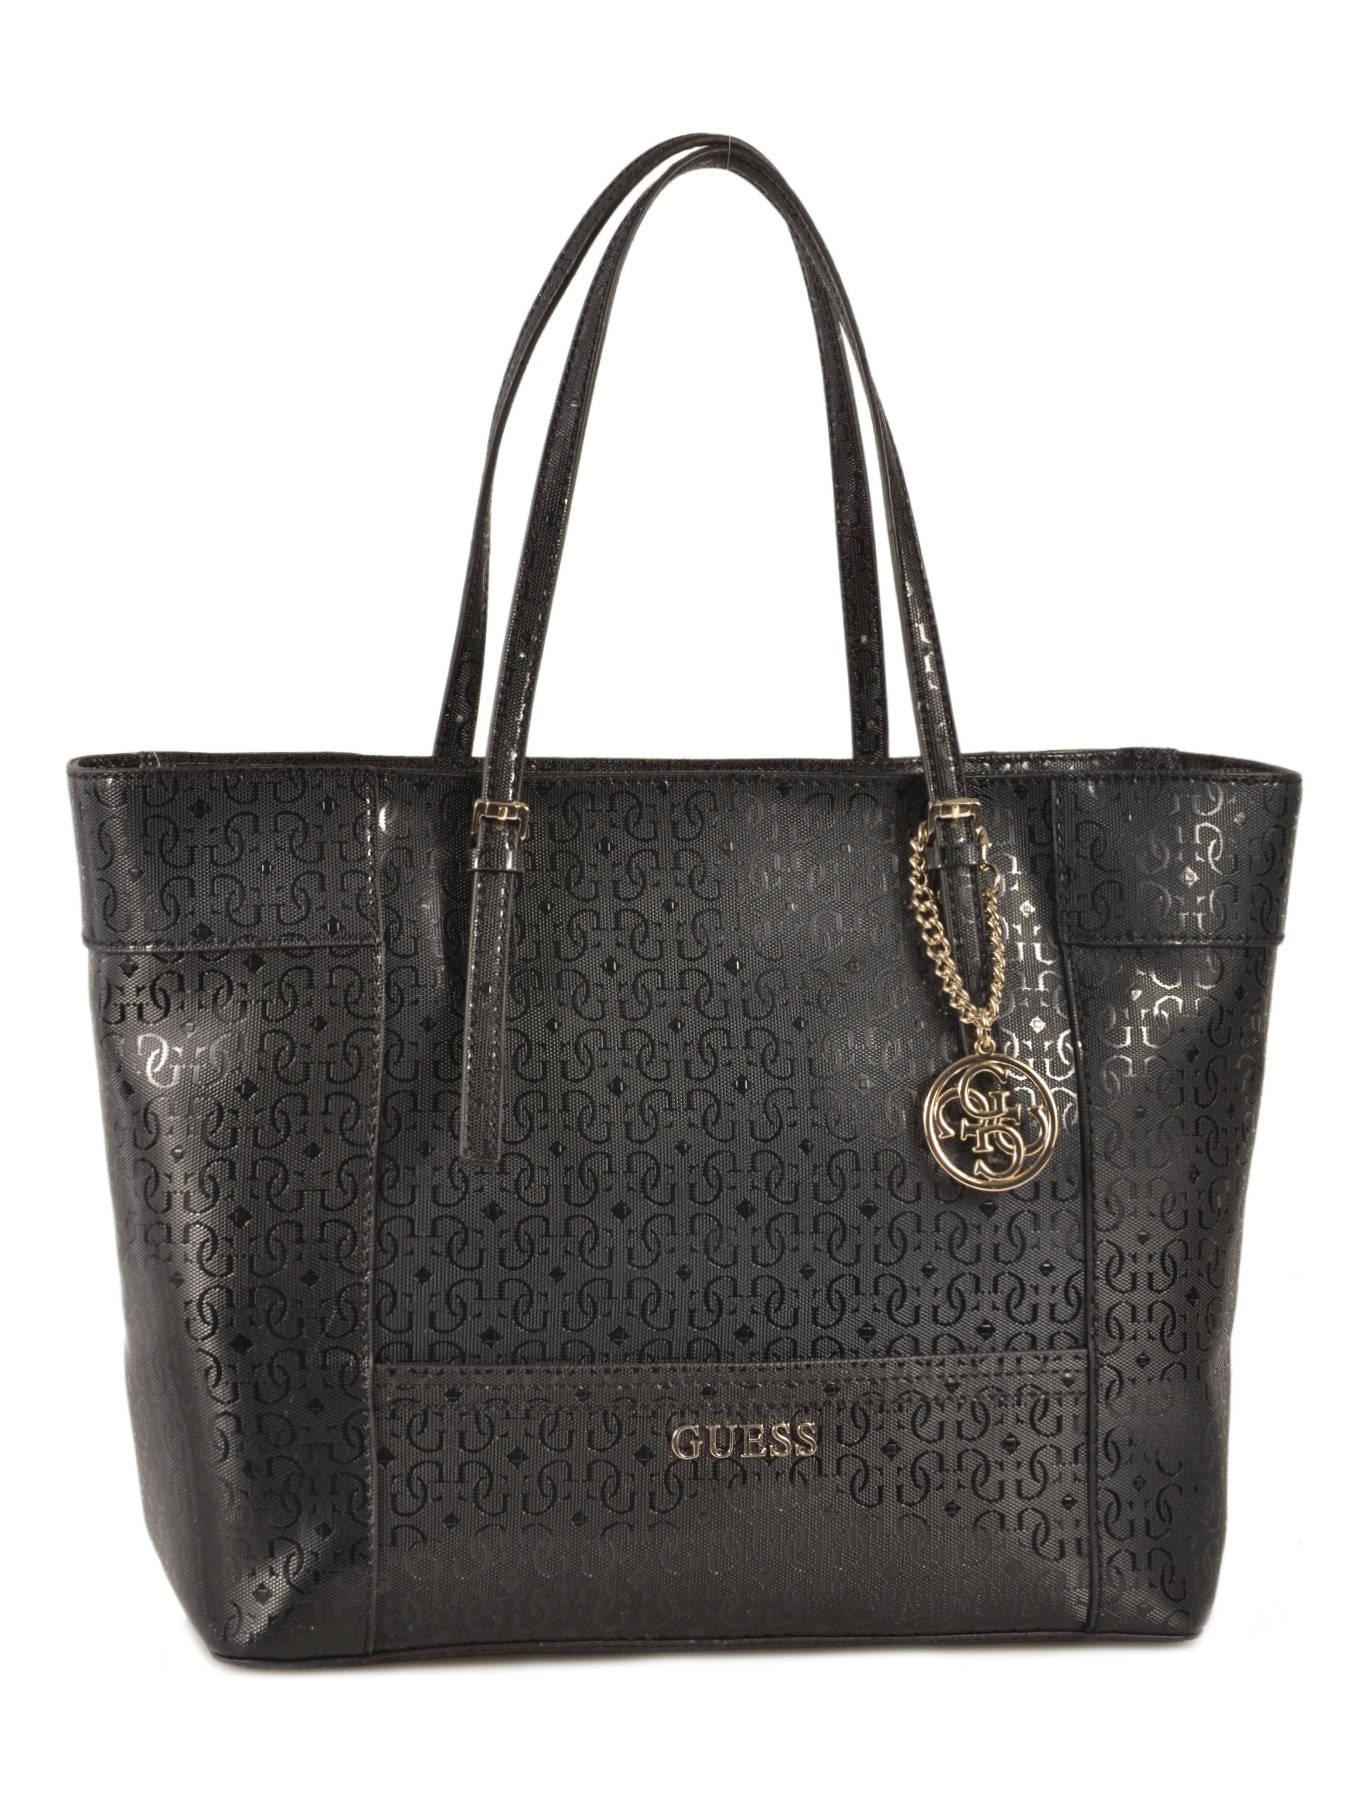 Sac Guess Noir Delaney : Delaney guess bag ge best prices